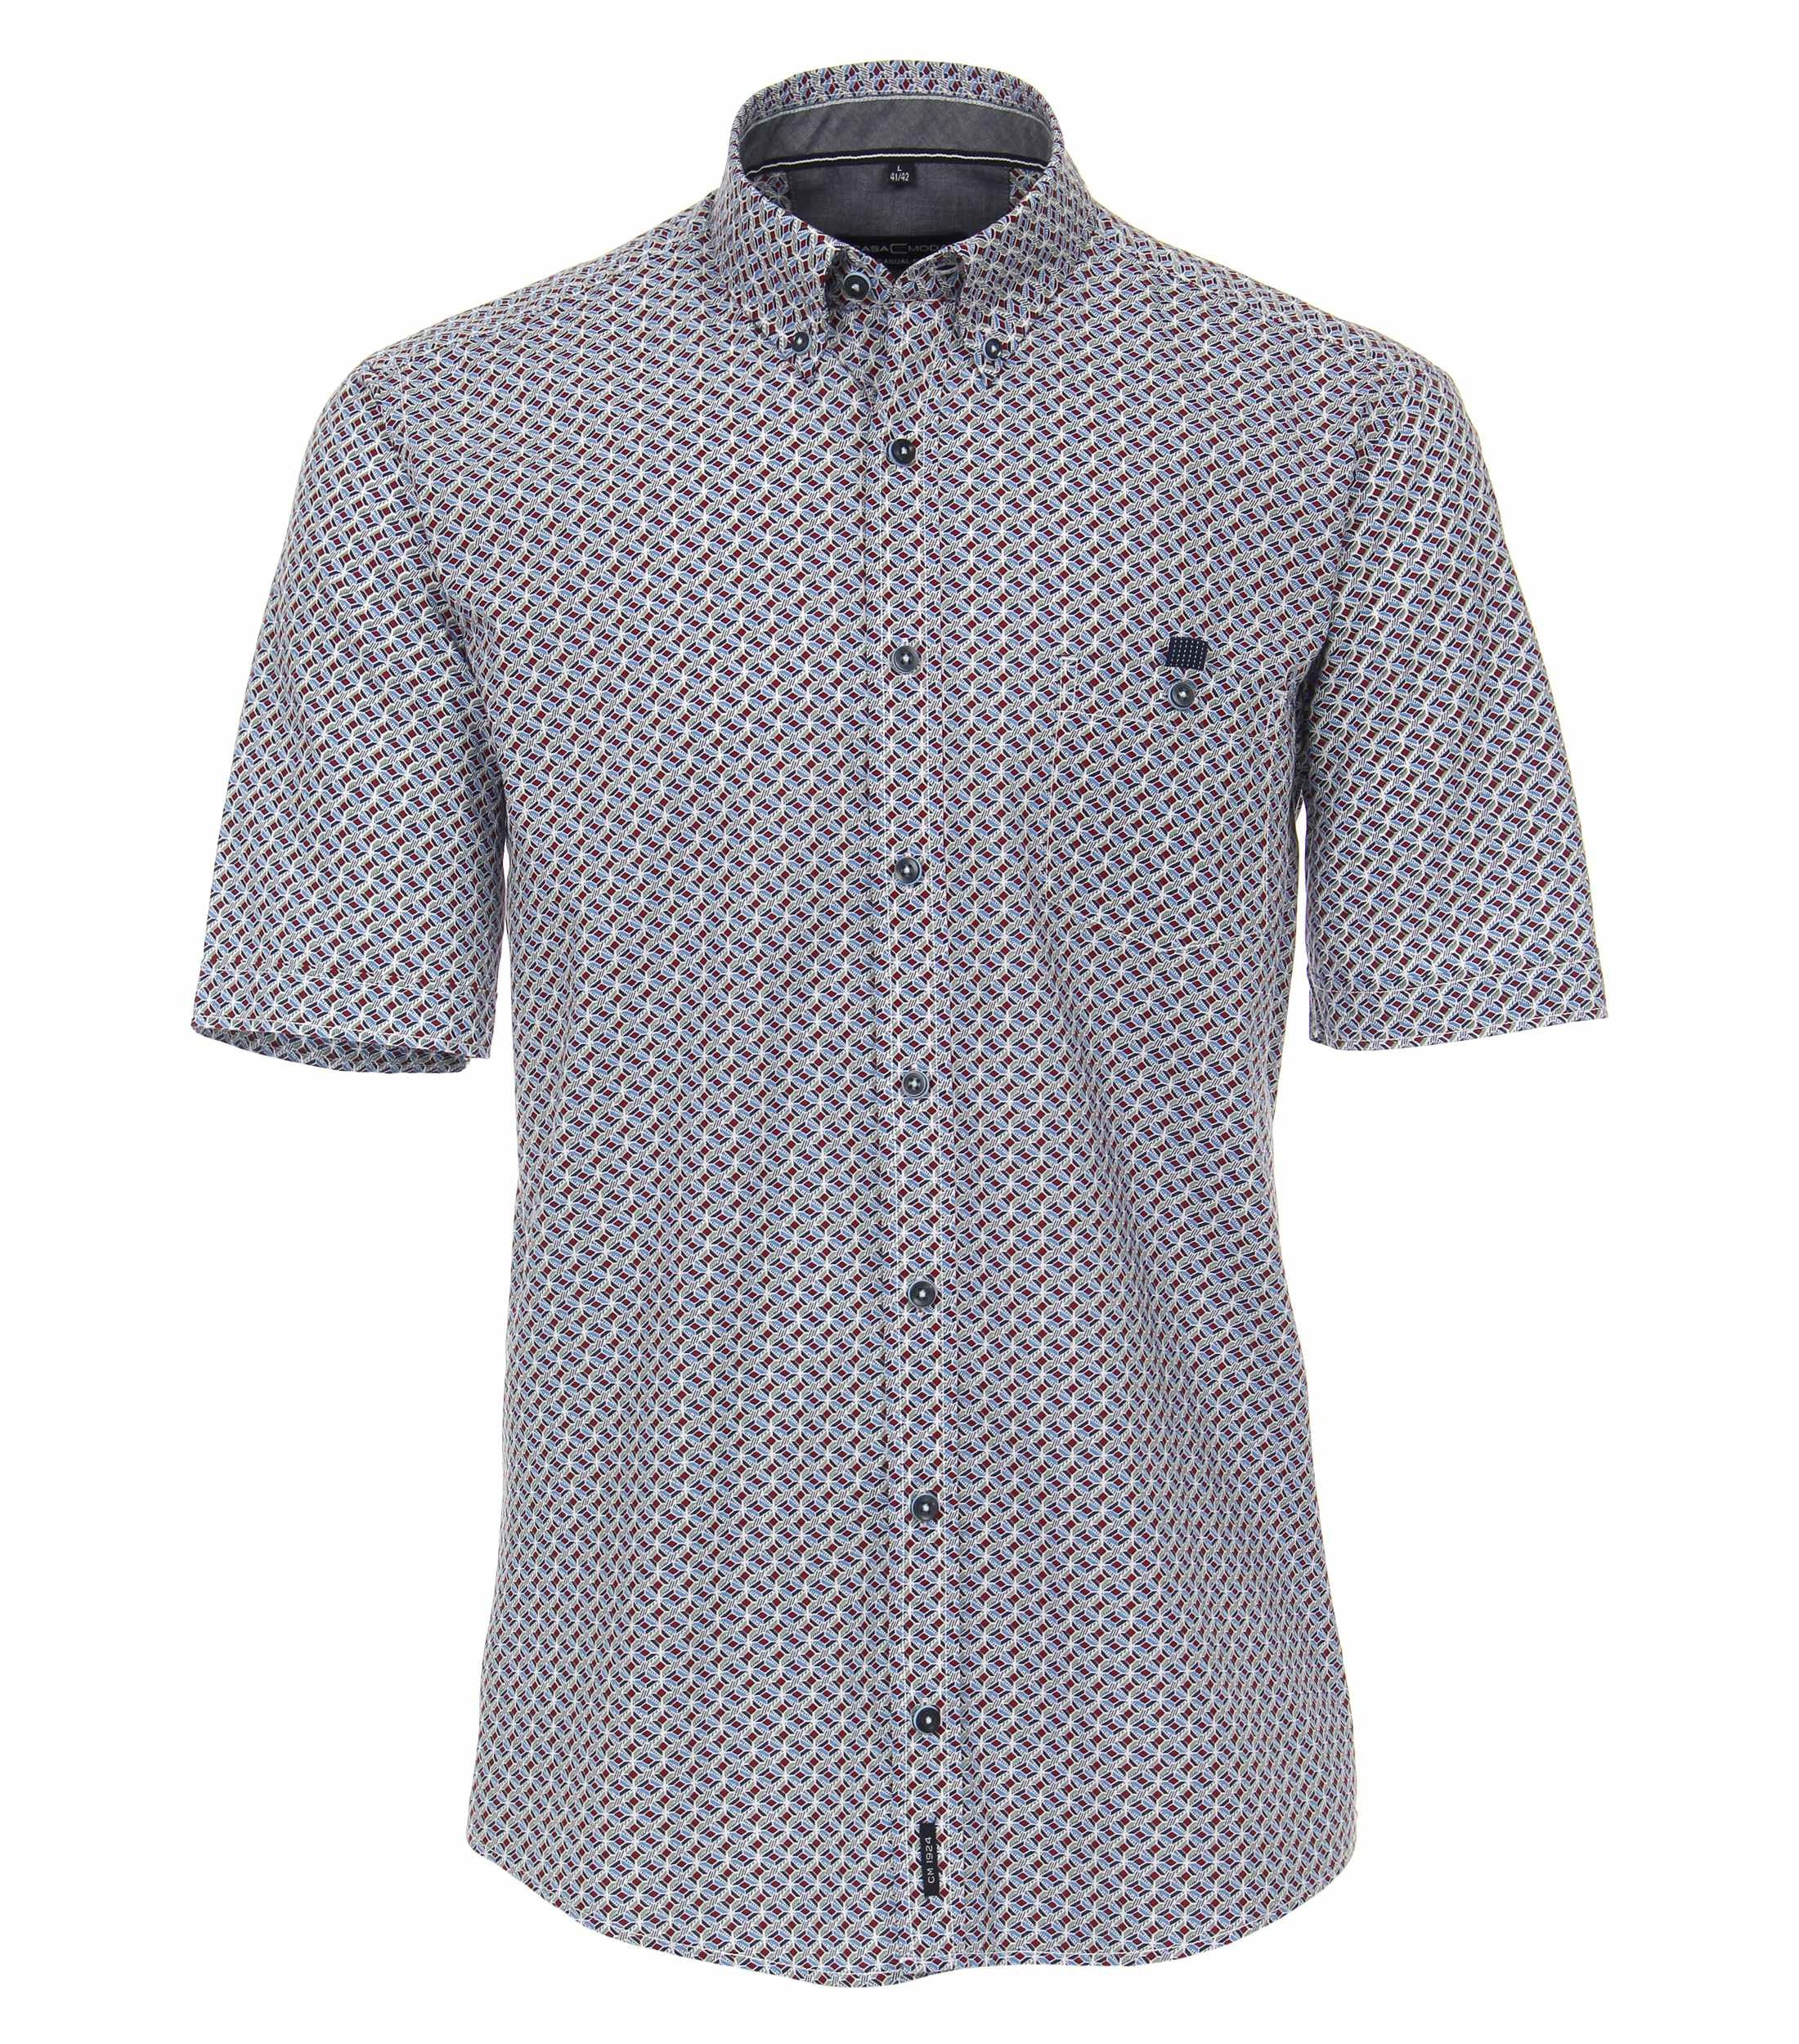 CasaModa kurzarm Hemd aus Baumwolle gemustert blau